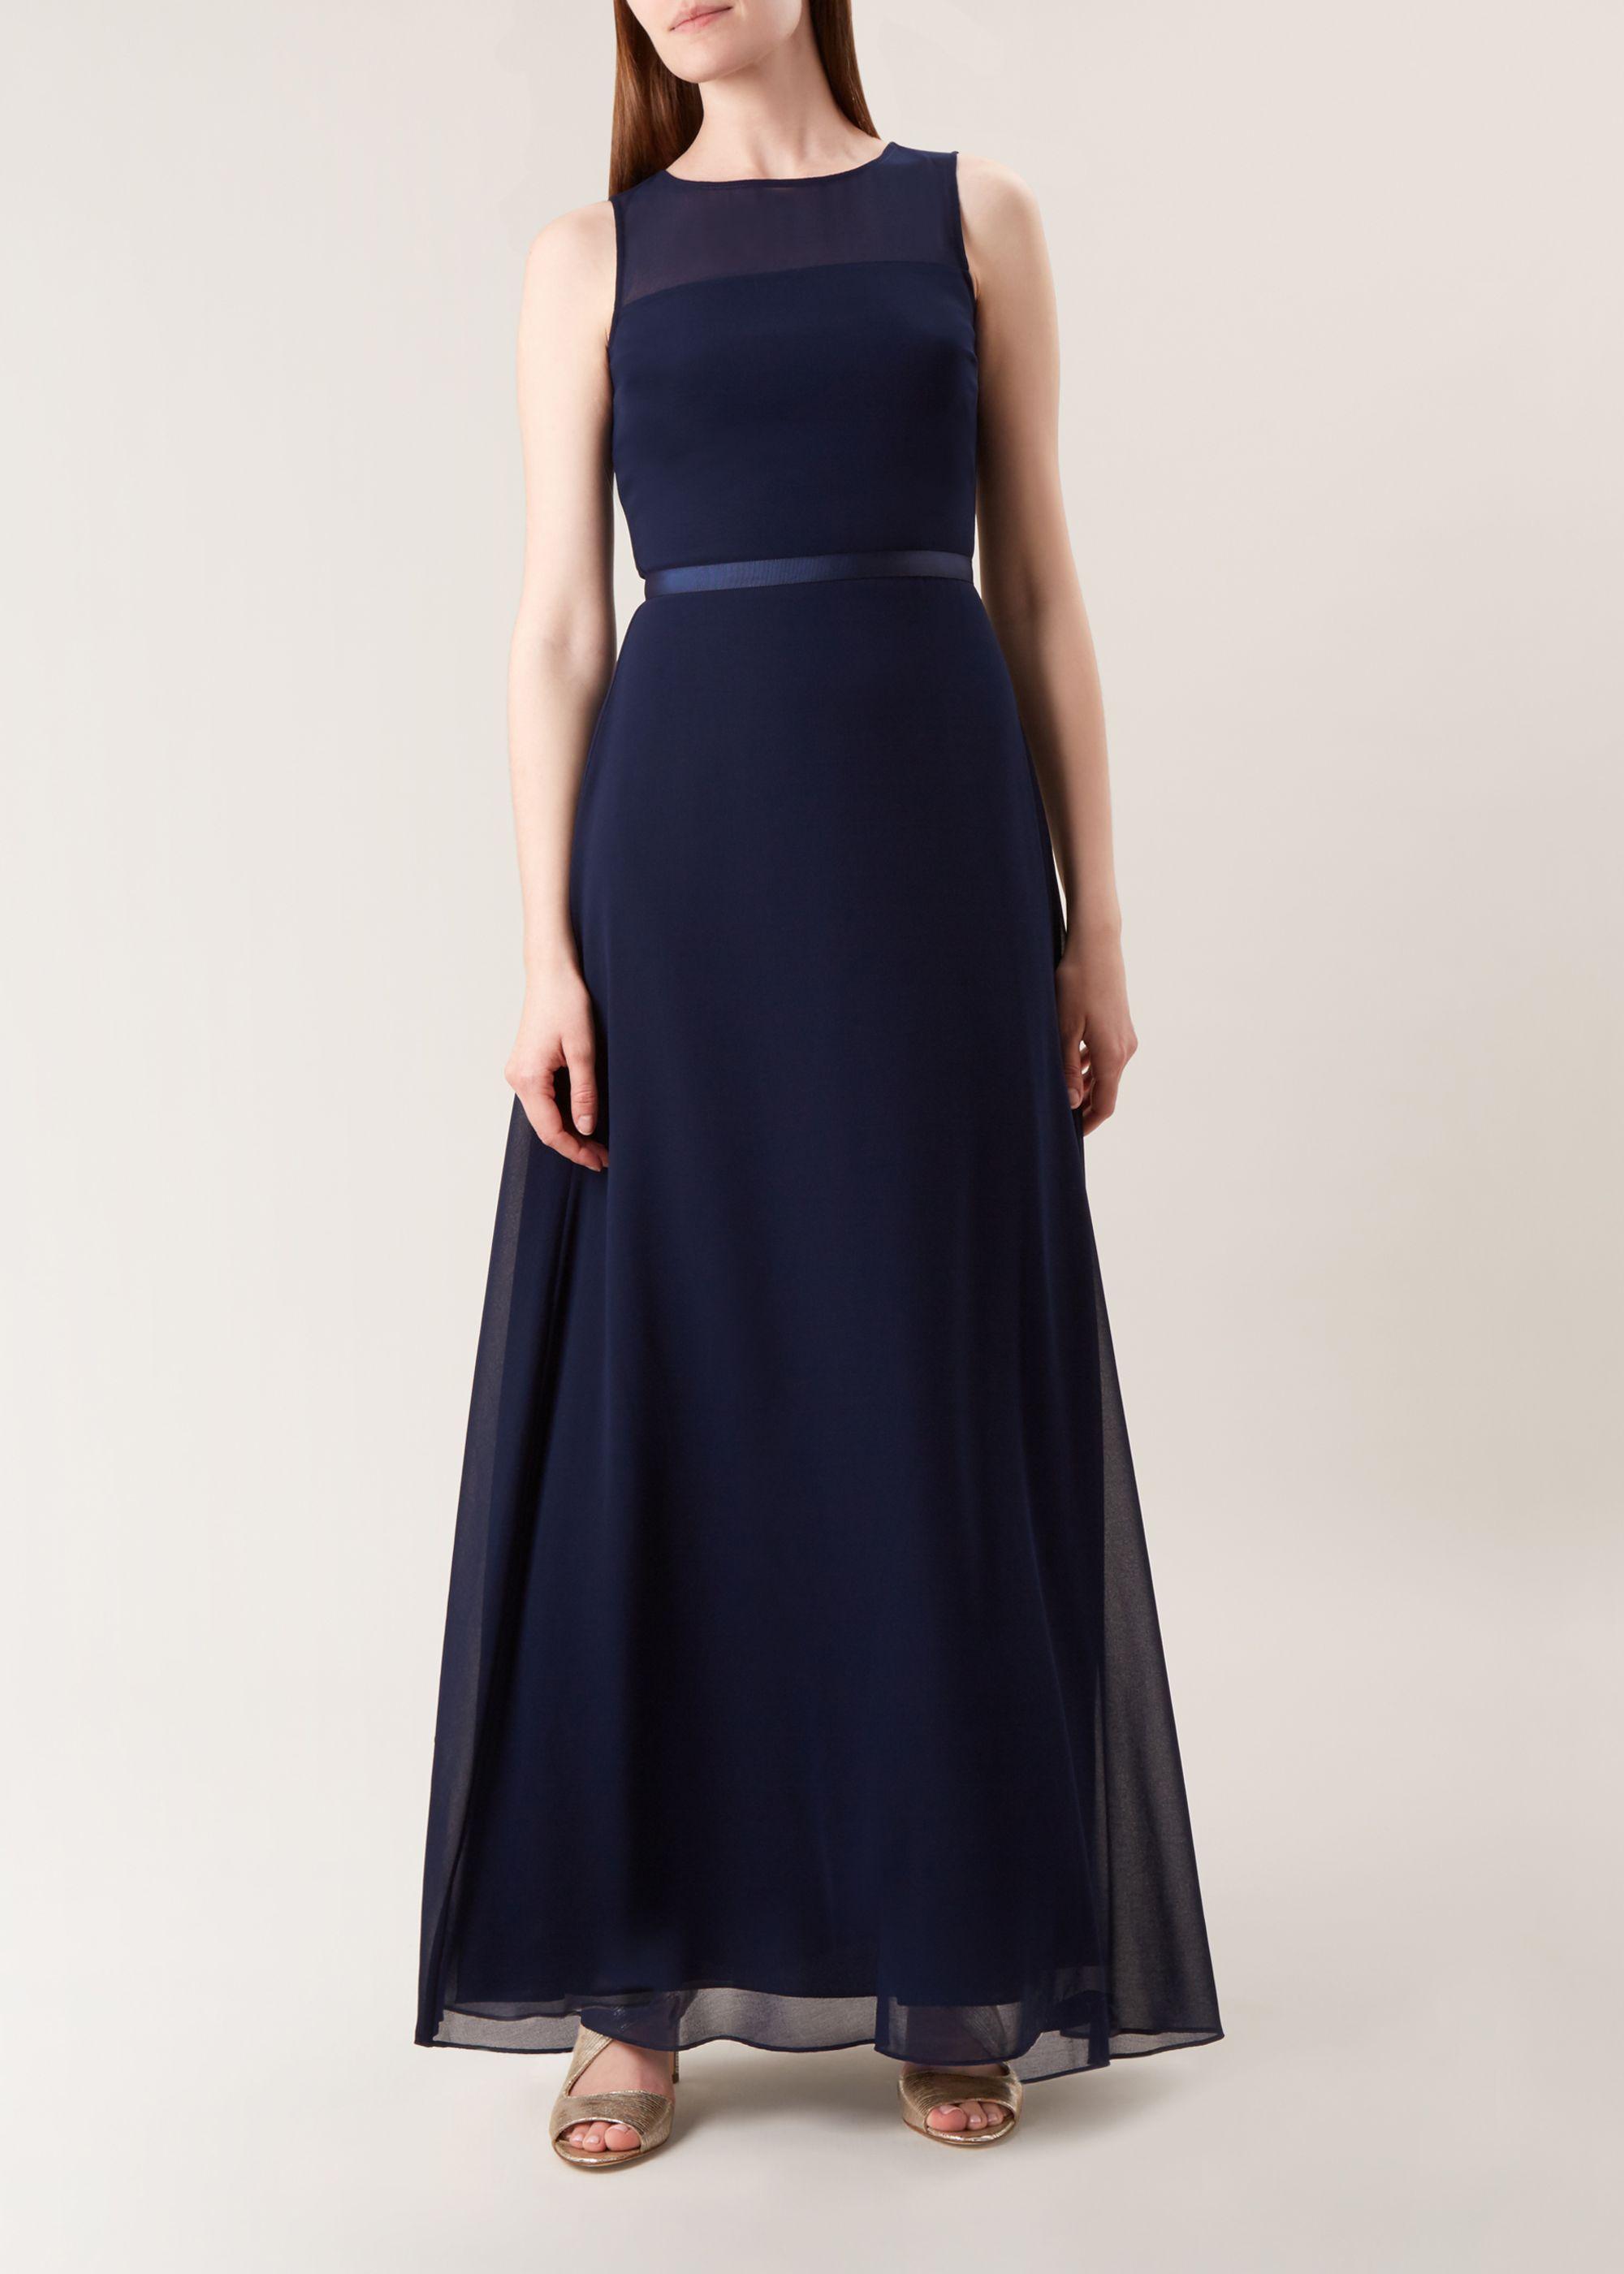 Hobbs Women Abigale Maxi Dress